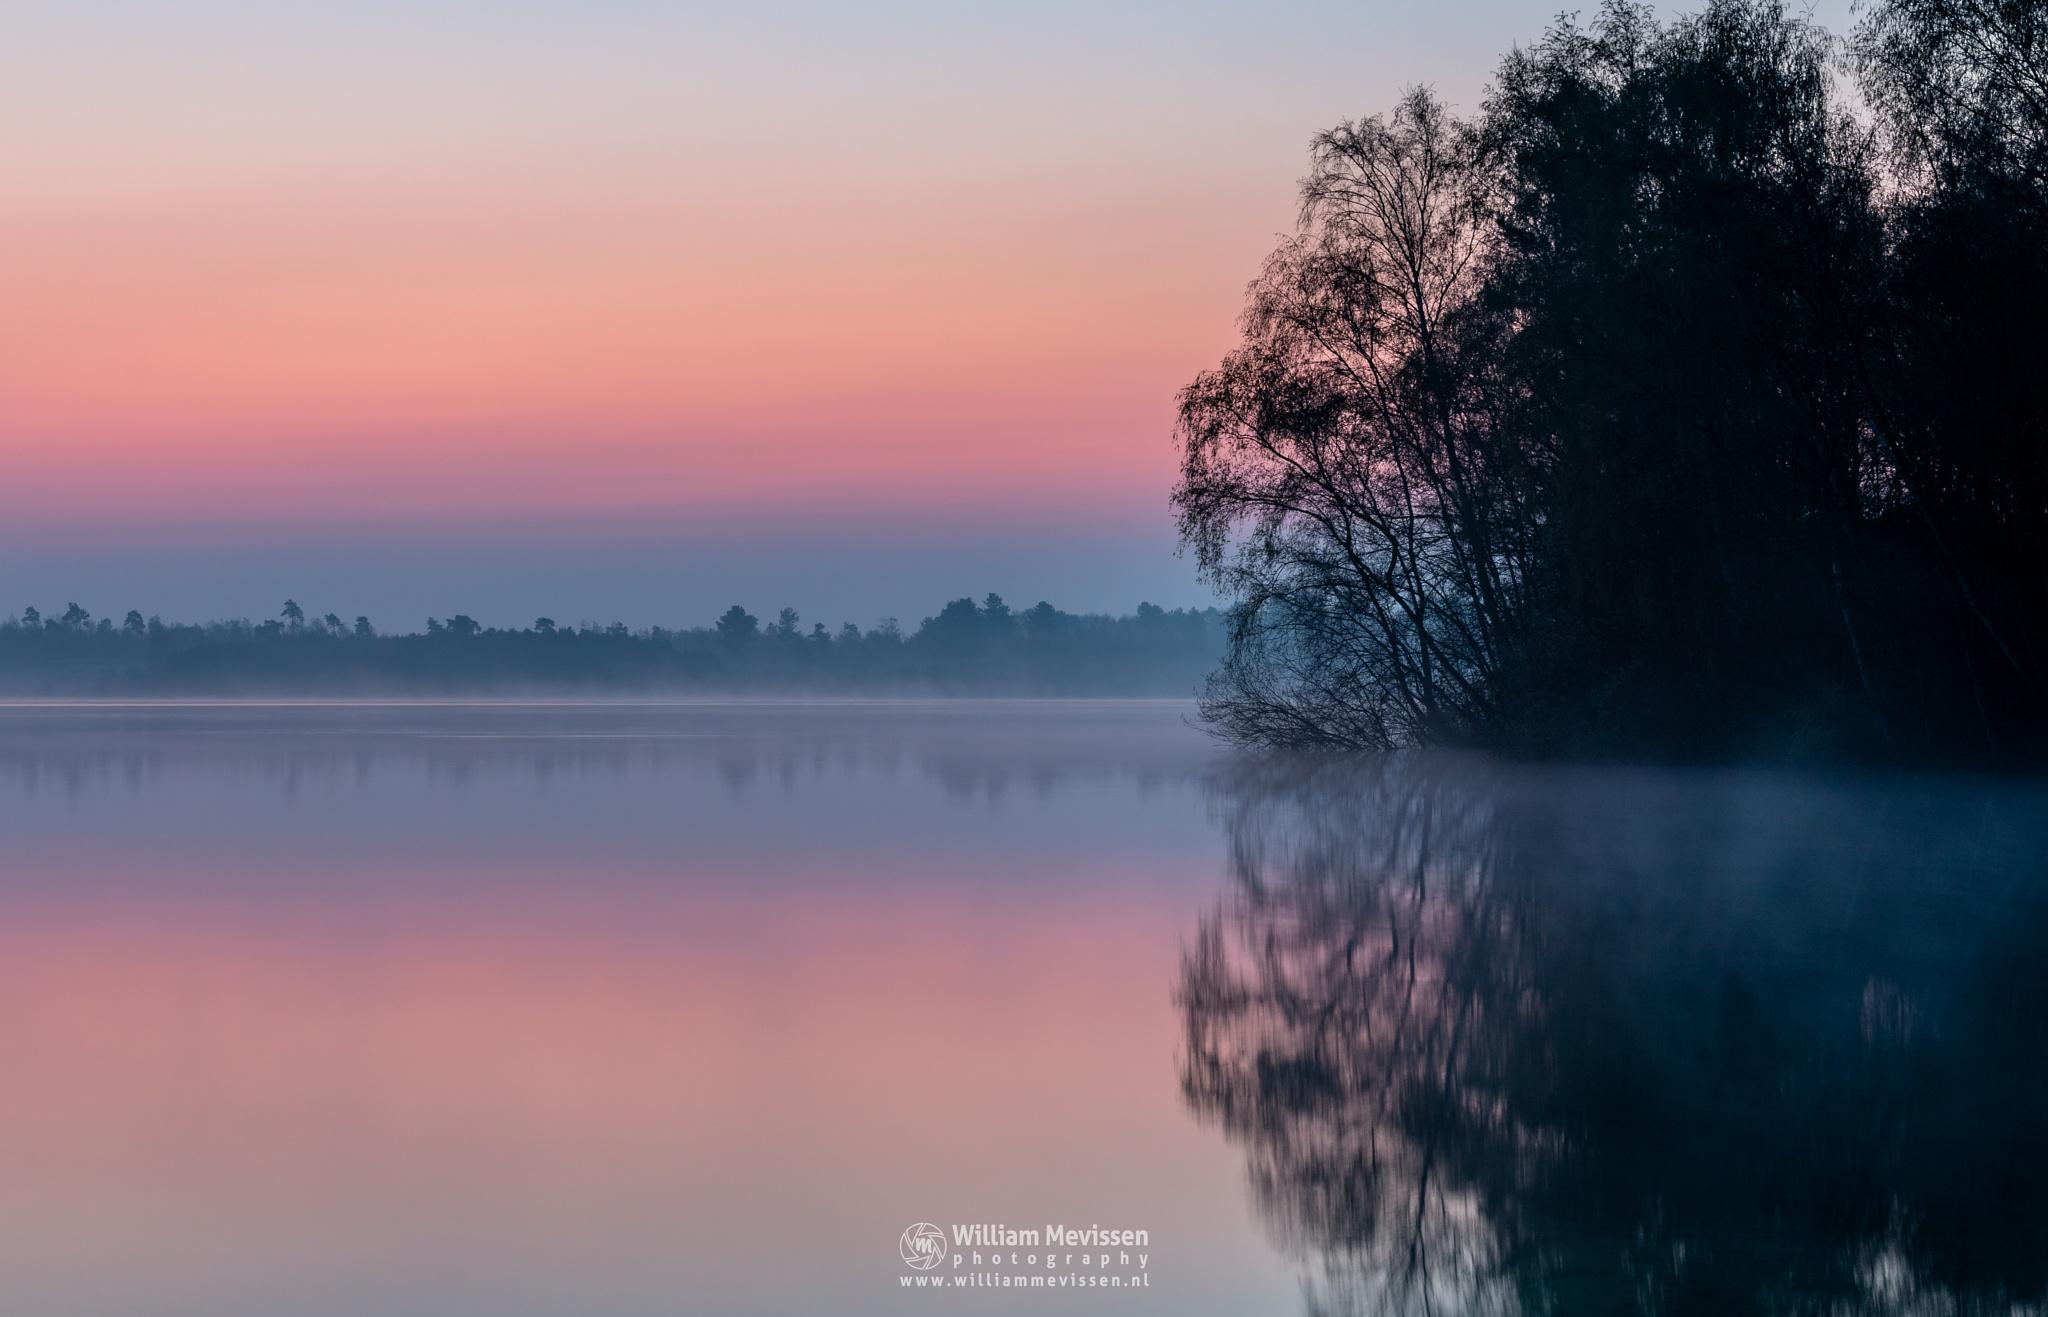 Photo in Landscape #tree #trees #pine #green #pine forest #forest #lake #reindersmeer #maasduinen #limburg #noord-limburg #well #national park #foggy #nature #twilight #silence #red #orange #pink #mist #misty #fog